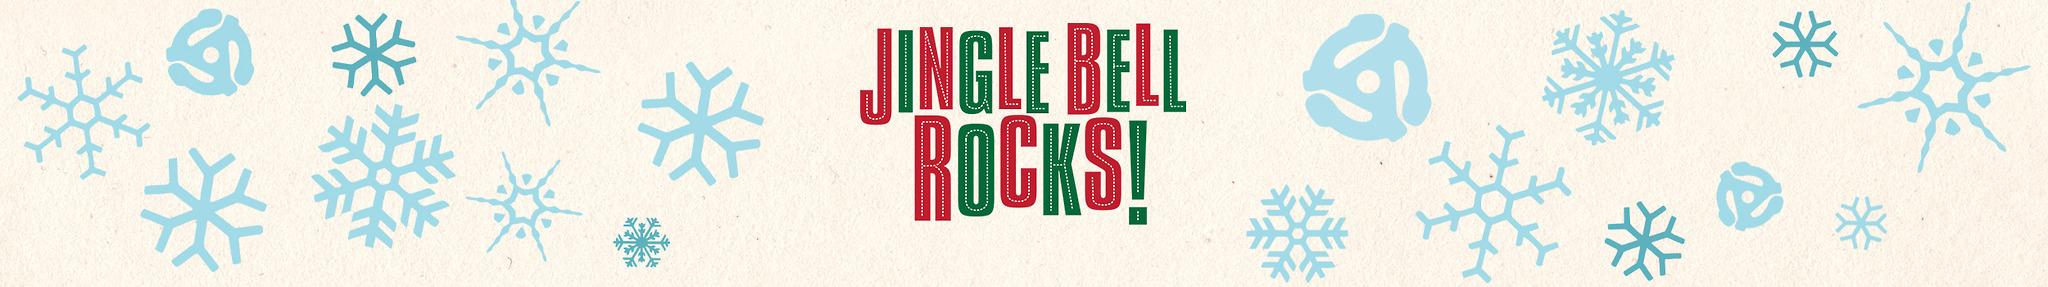 Jingle Bell Rock On Tumblr intro c c g g. jingle bell rock on tumblr